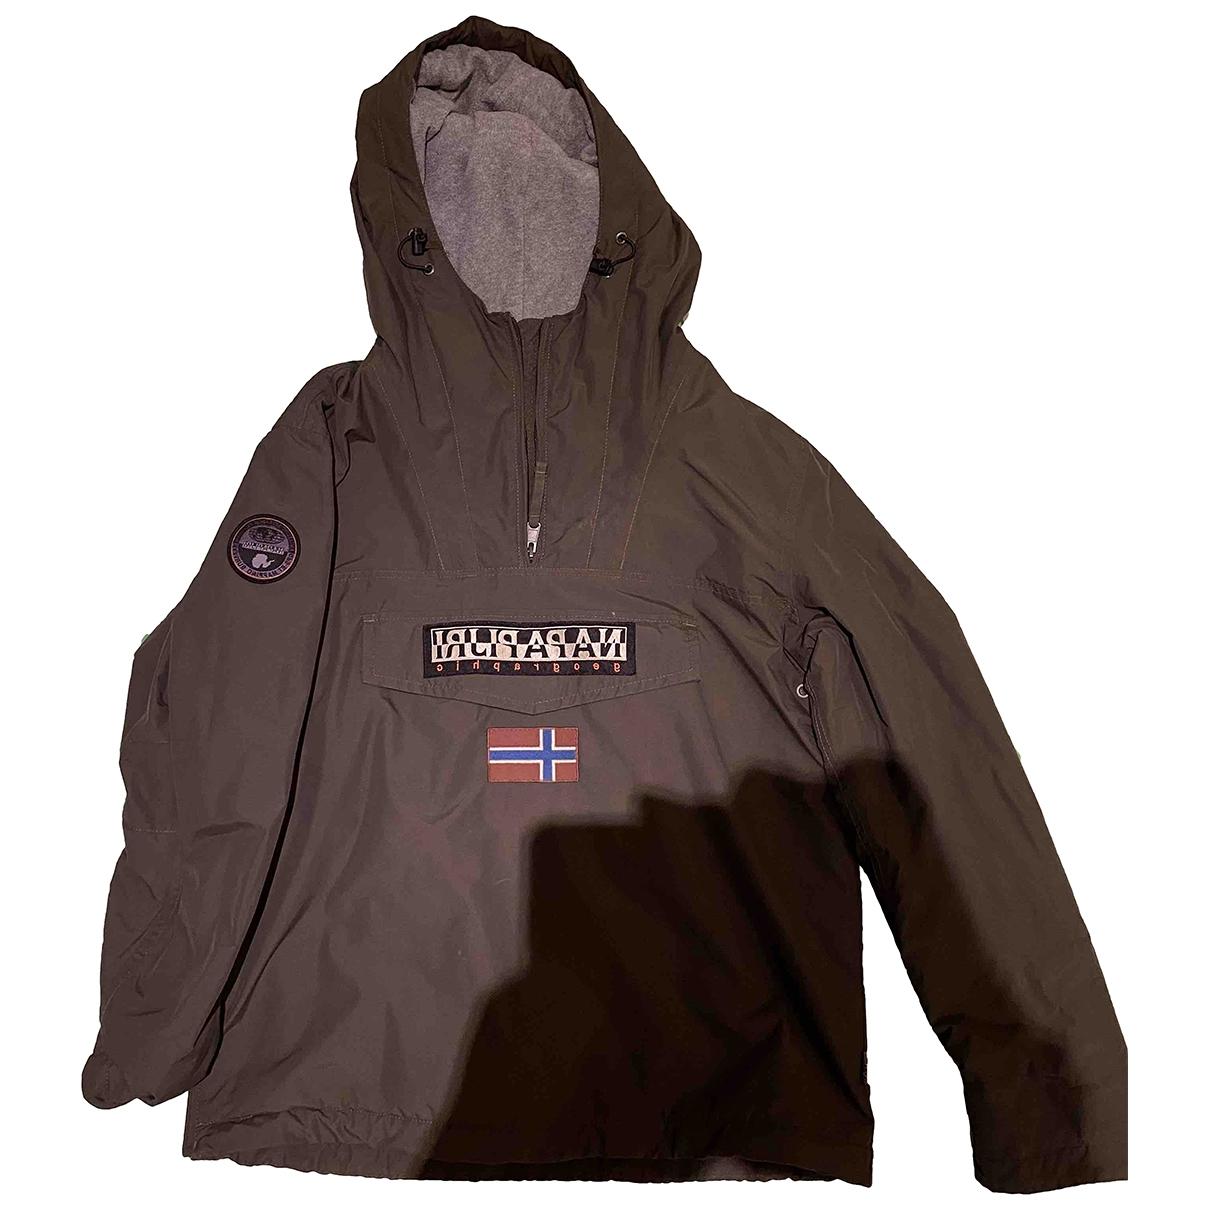 Napapijri \N Khaki jacket  for Men L International